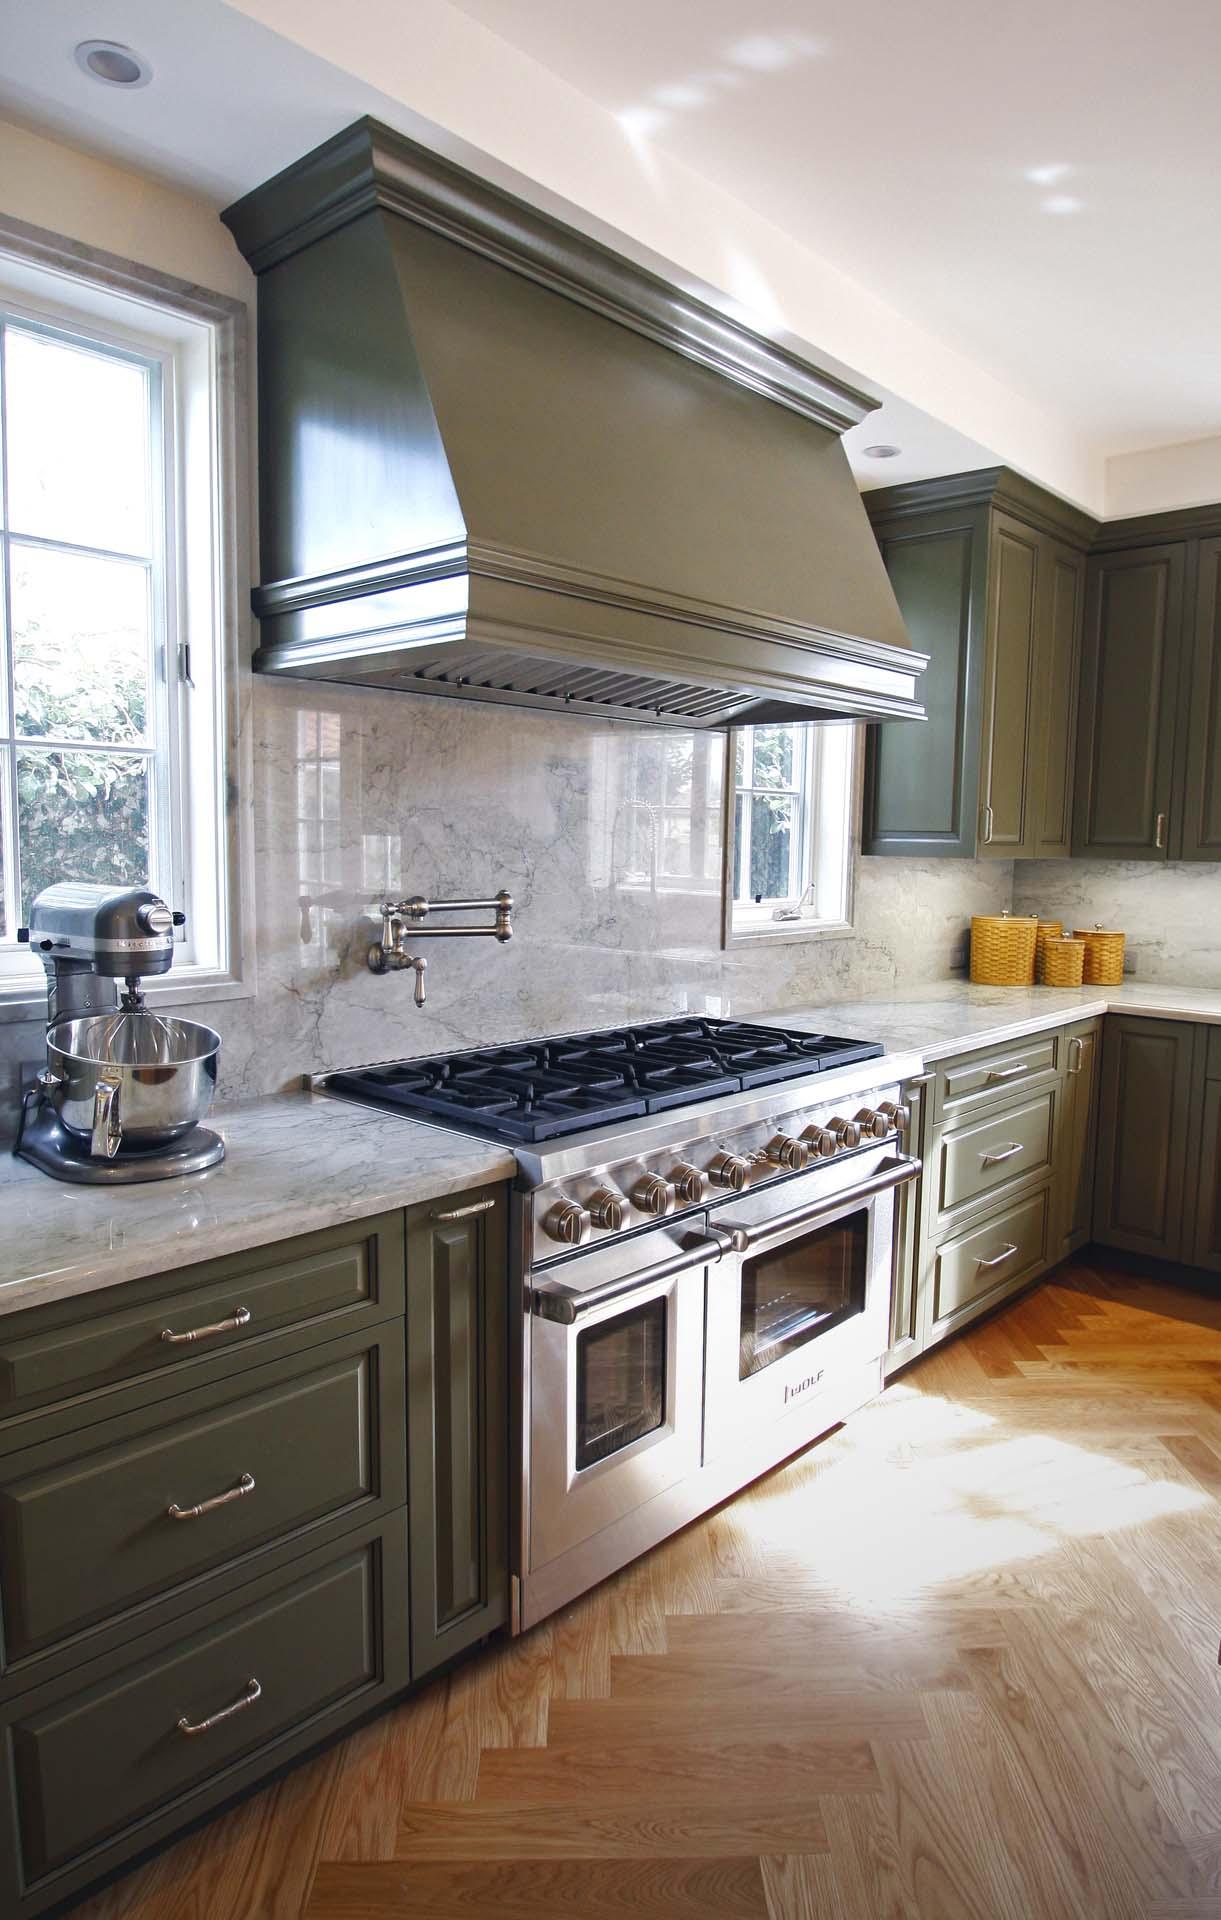 kitchen+range+wall